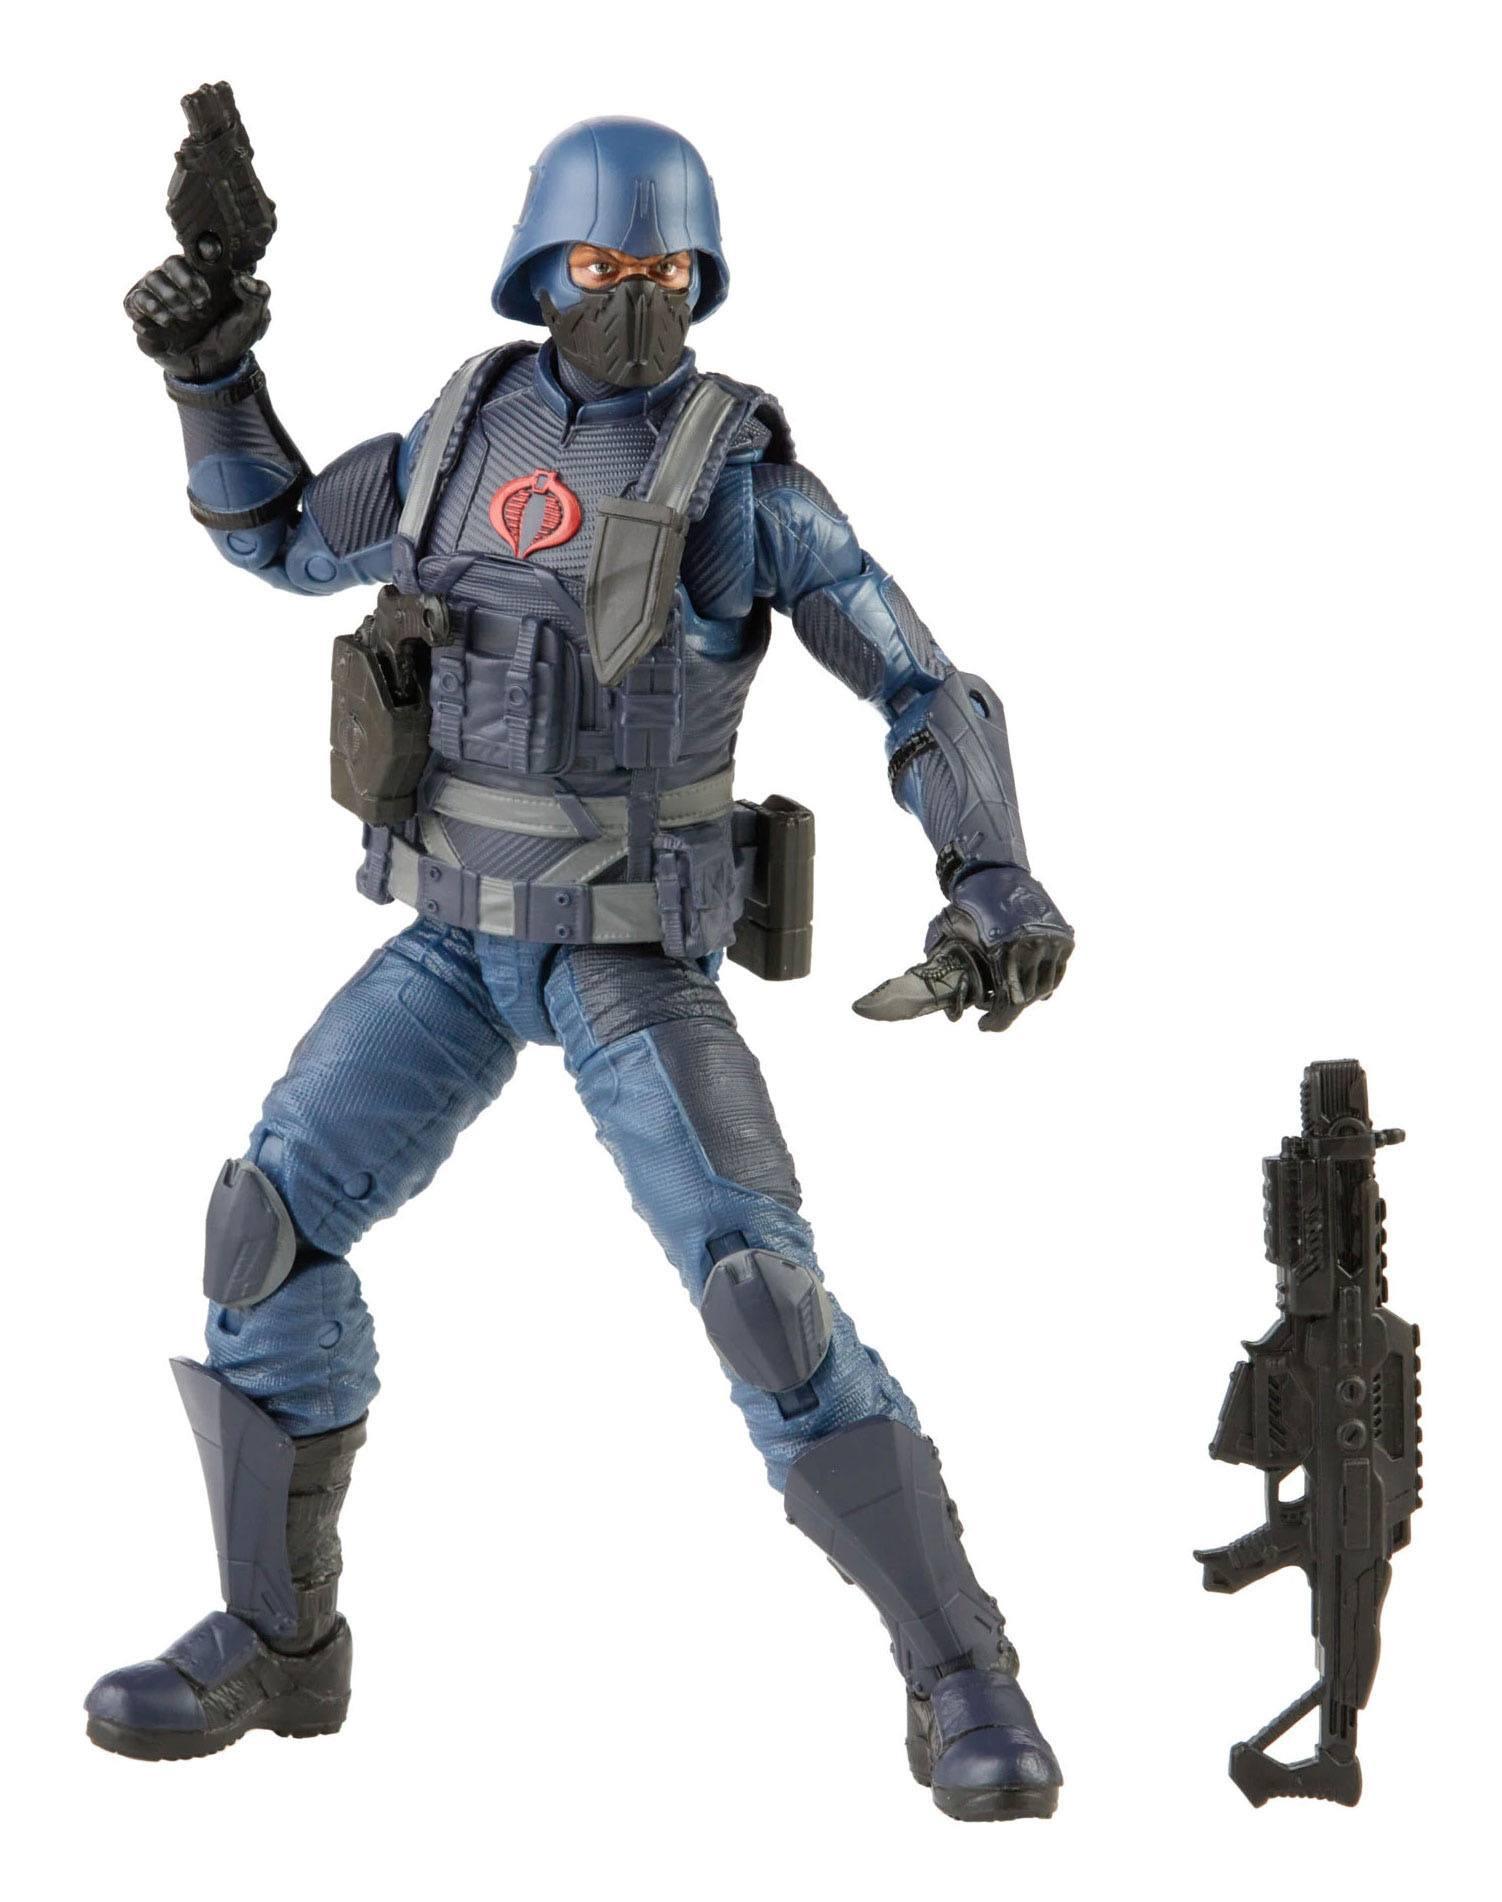 G.I. Joe Classified Series Cobra Infantry 15cm Actionfigur F2718 5010993831289